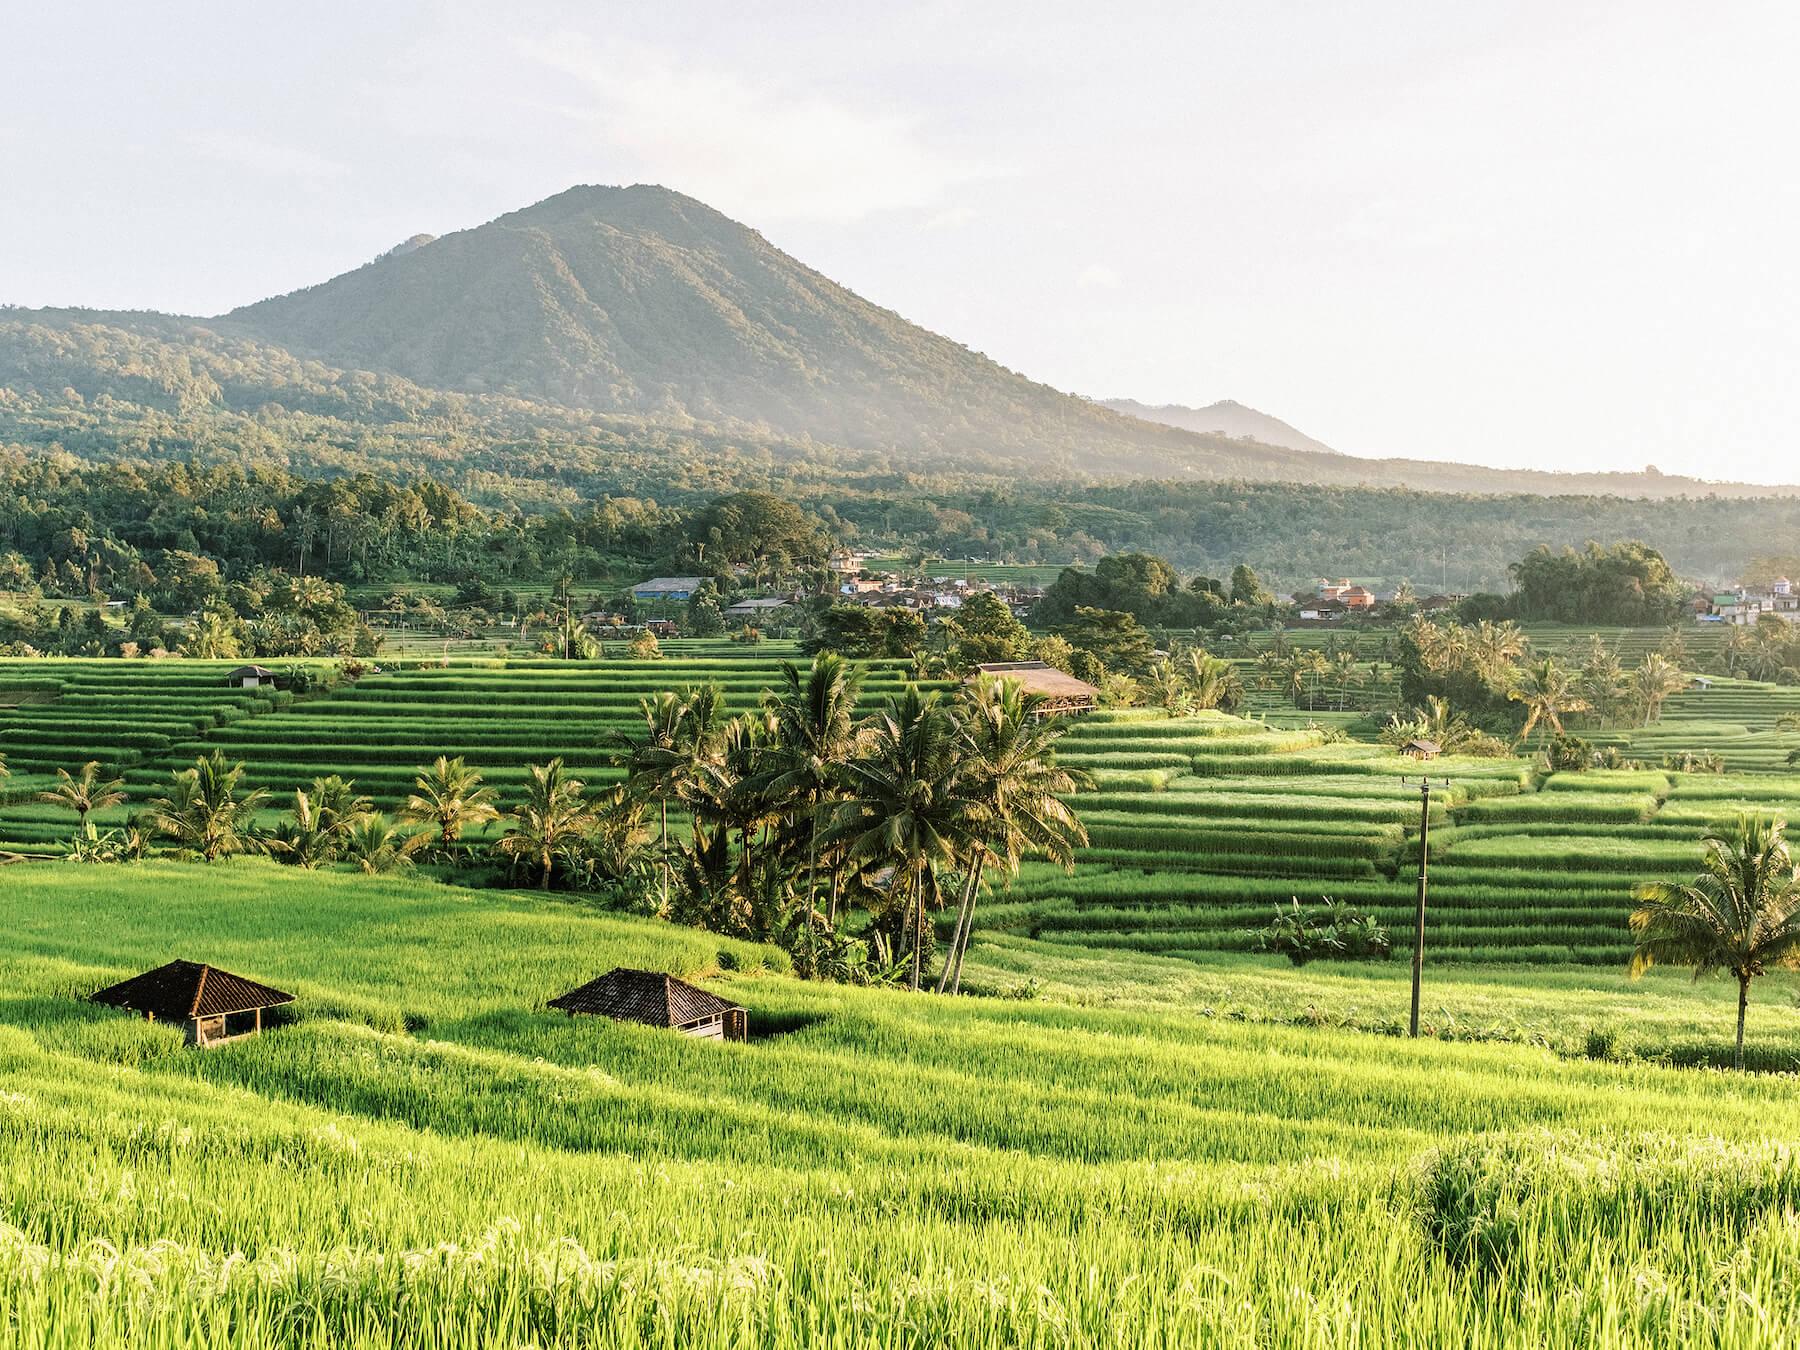 Travel home decor, fine art print of Bali Jatiluwih in Bali, Indonesia